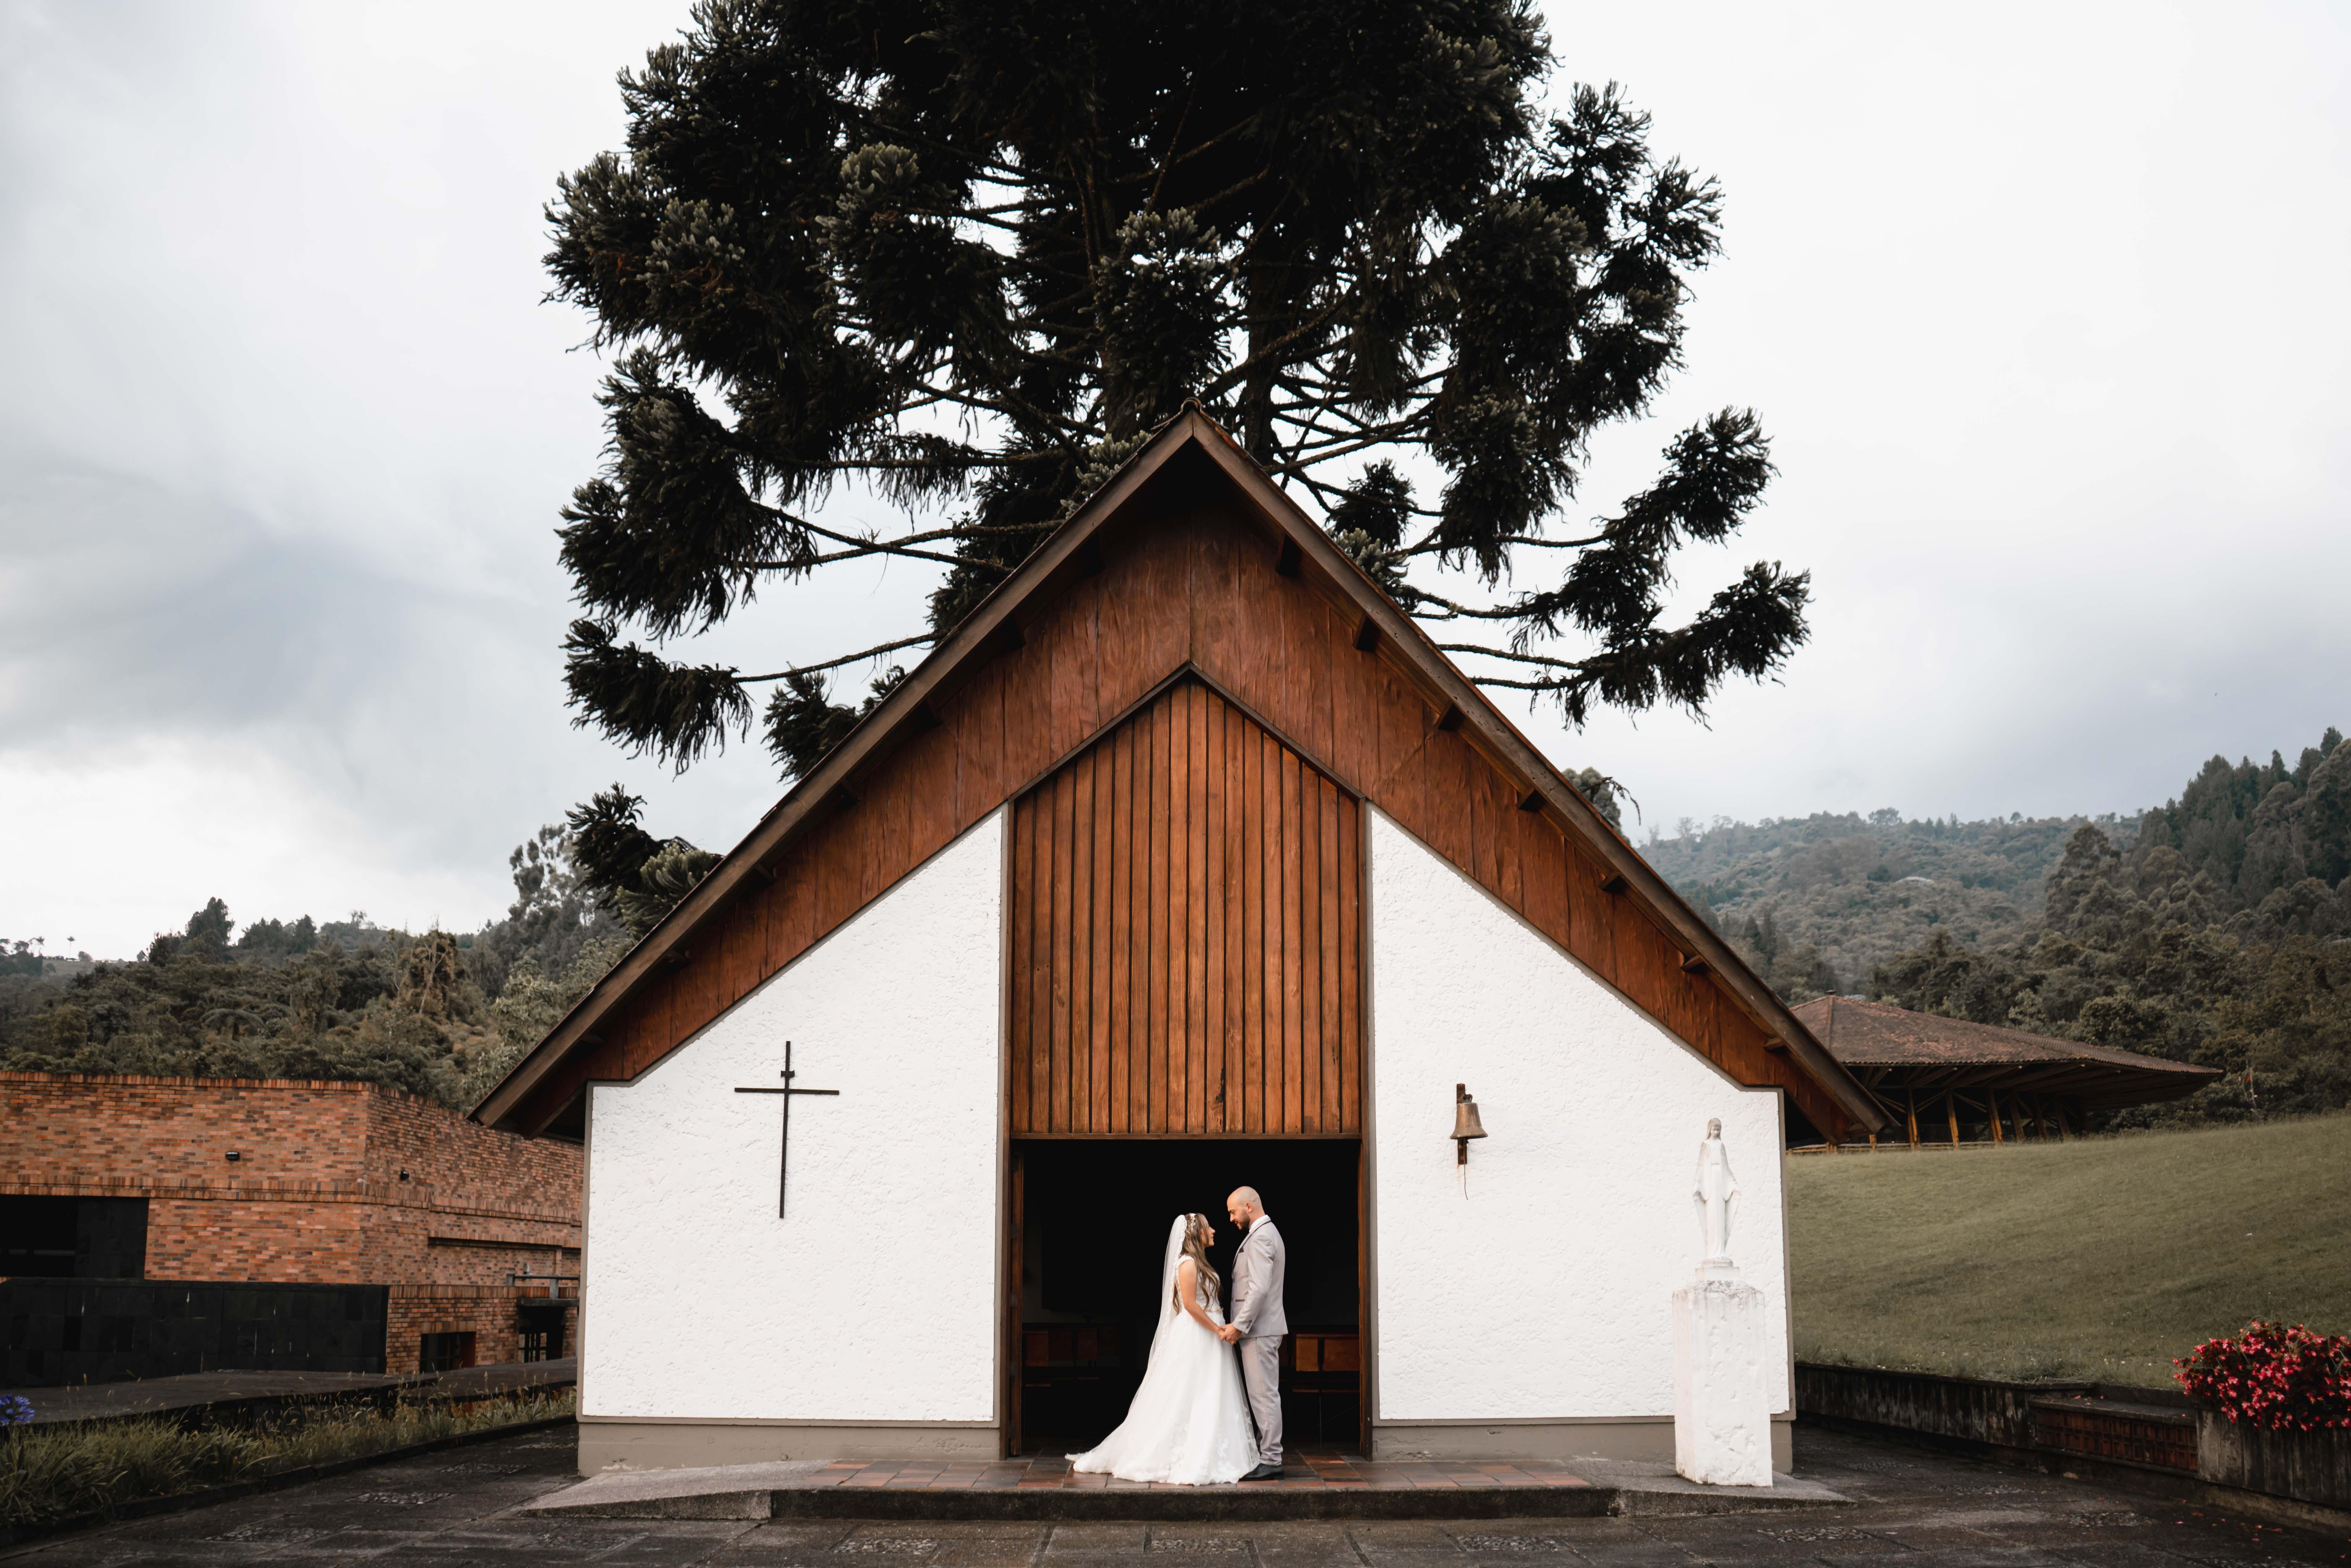 fotógrafo de bodas pereira